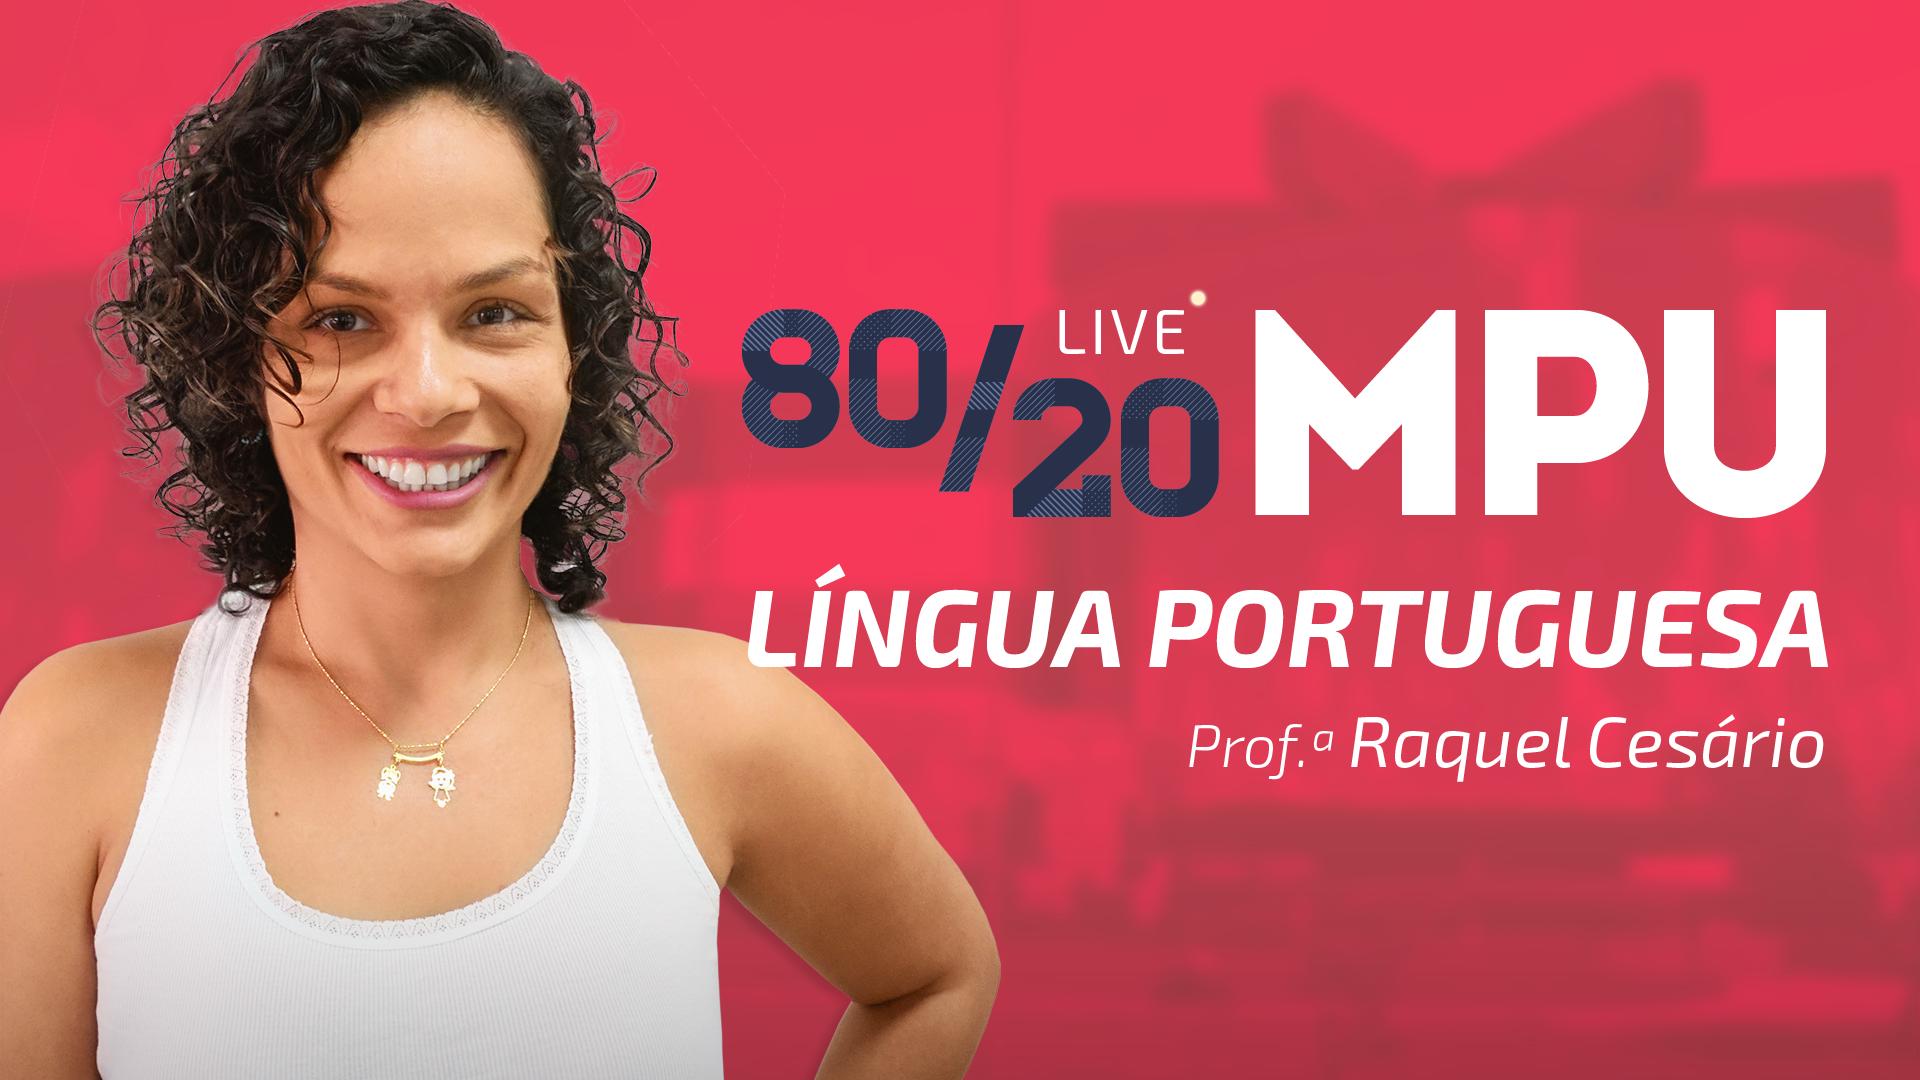 80/20 MPU Língua Portuguesa para Técnico e Analista